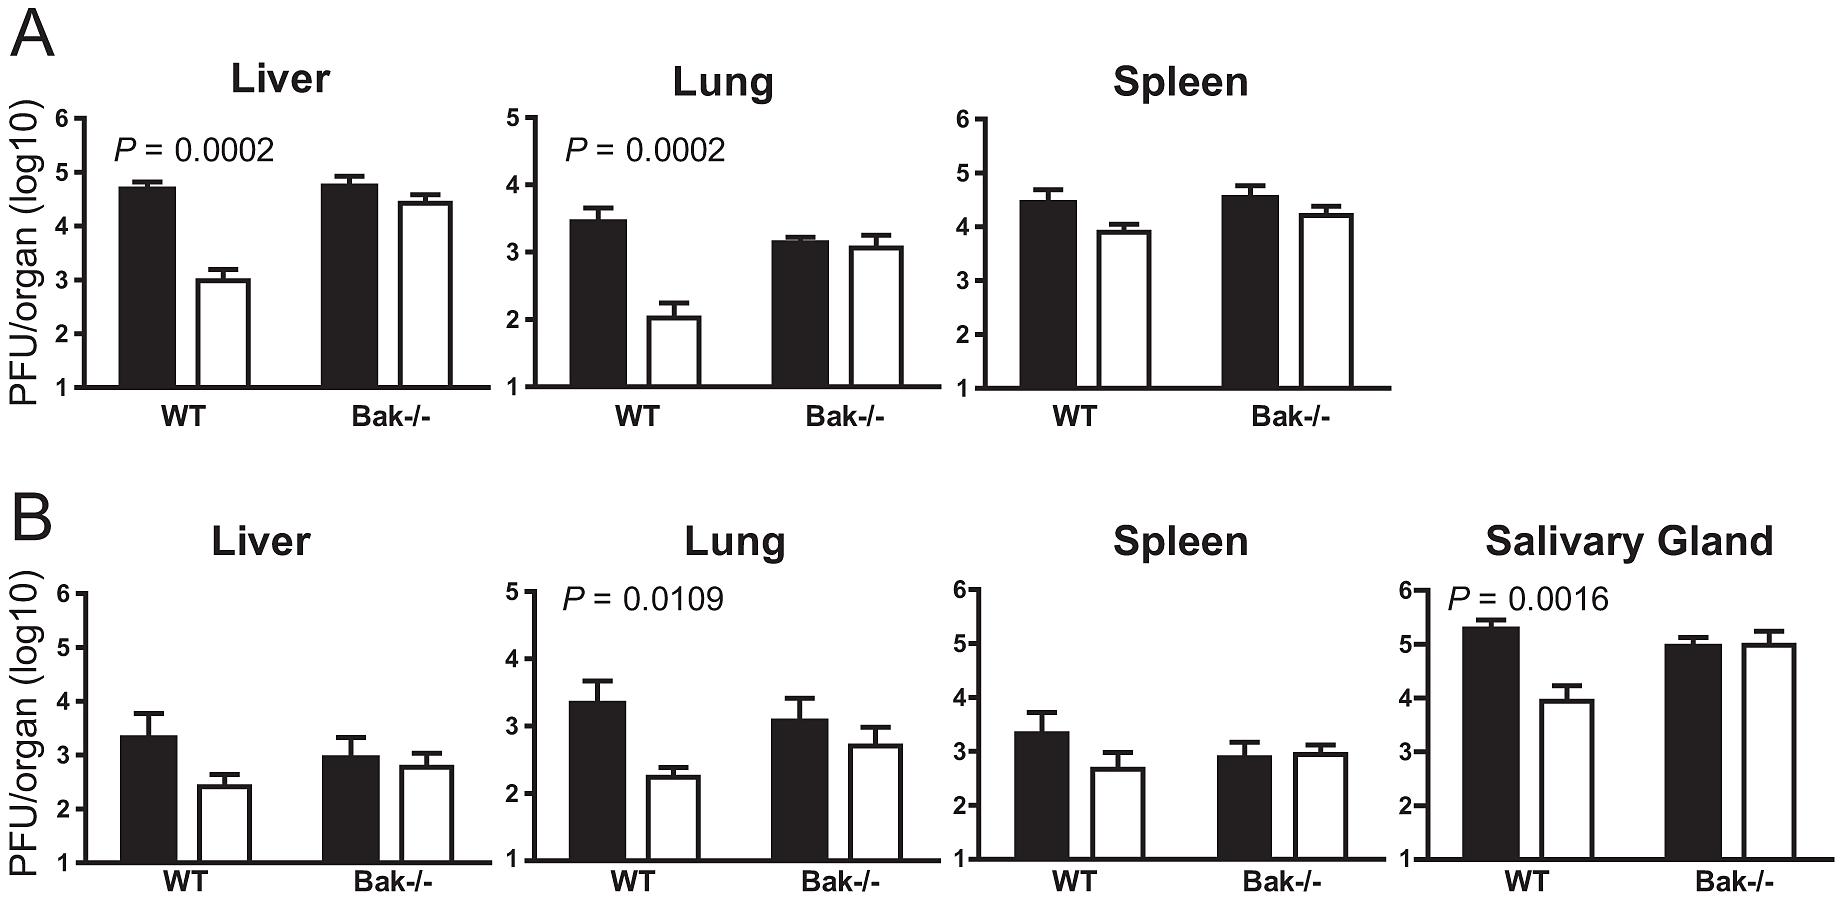 m41.1 inhibits Bak <i>in vivo</i>.